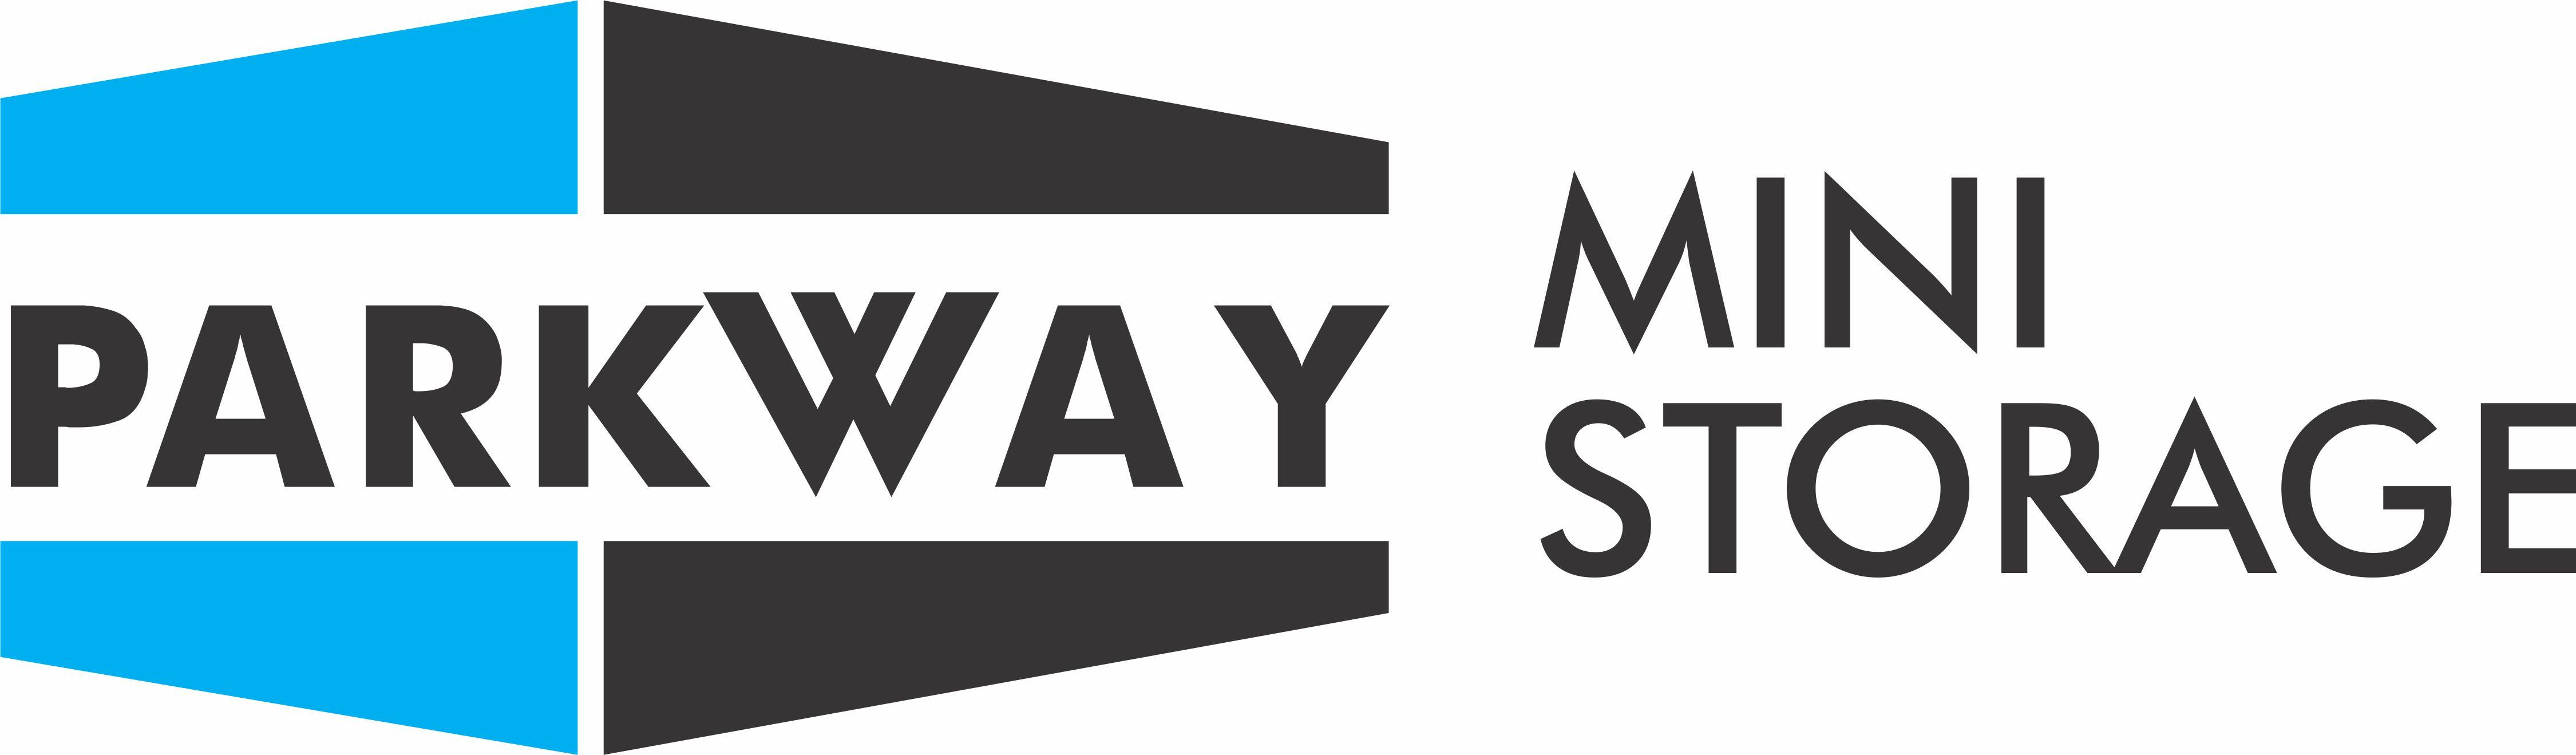 Parkway Mini Storage